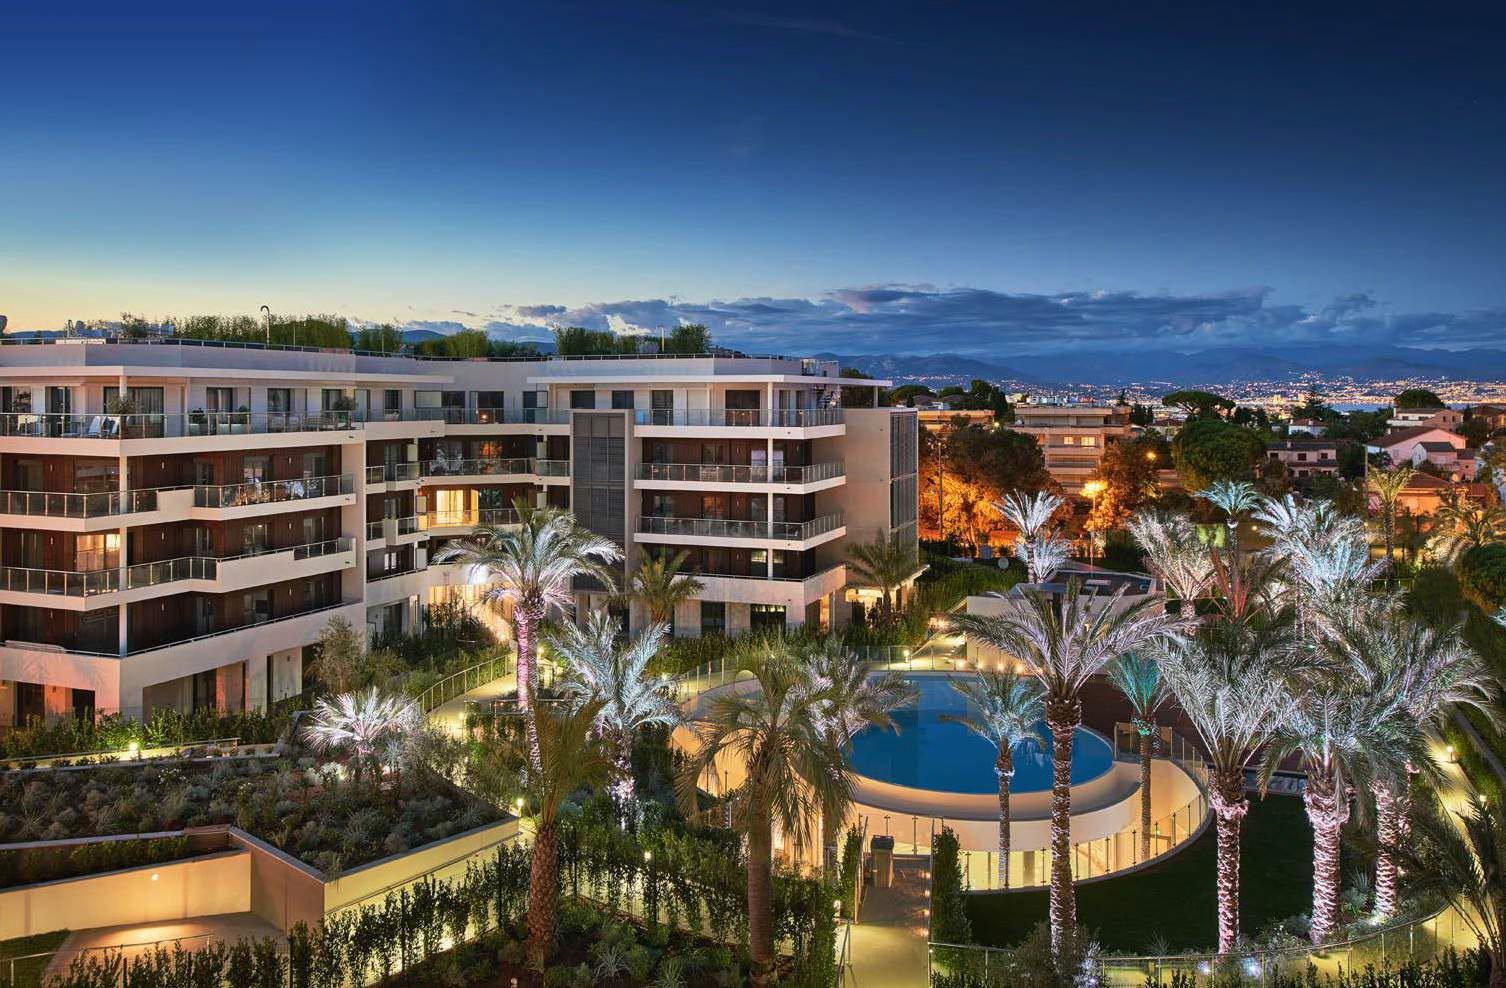 3 bedroom villa in new luxury residence - Cap d'Antibes